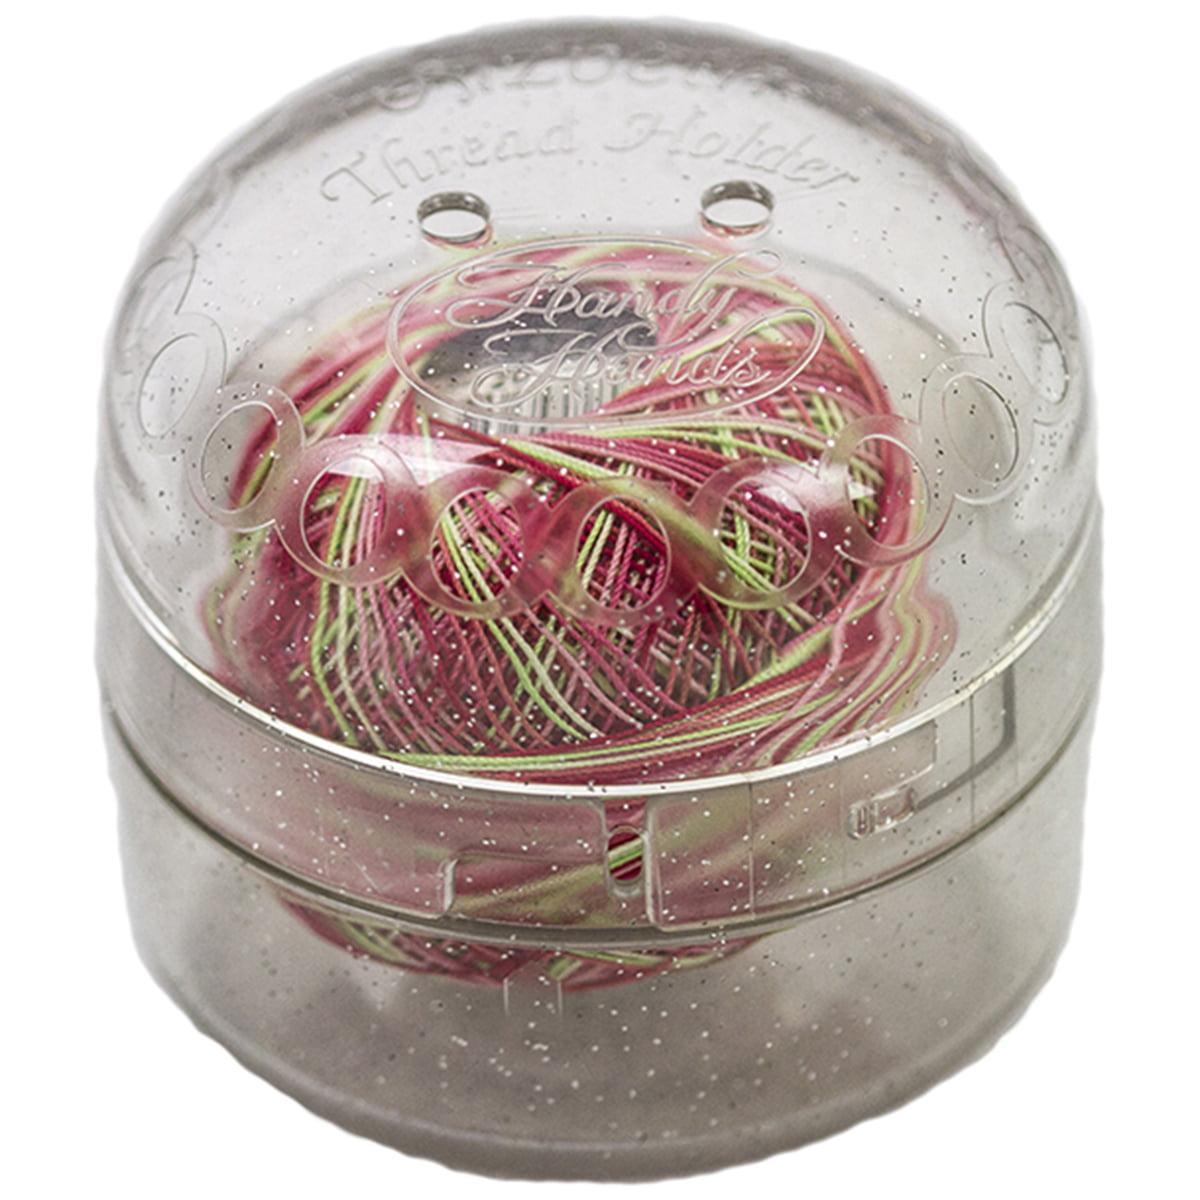 Lizbeth Thread Holder-Sparkle Clear - image 1 of 1